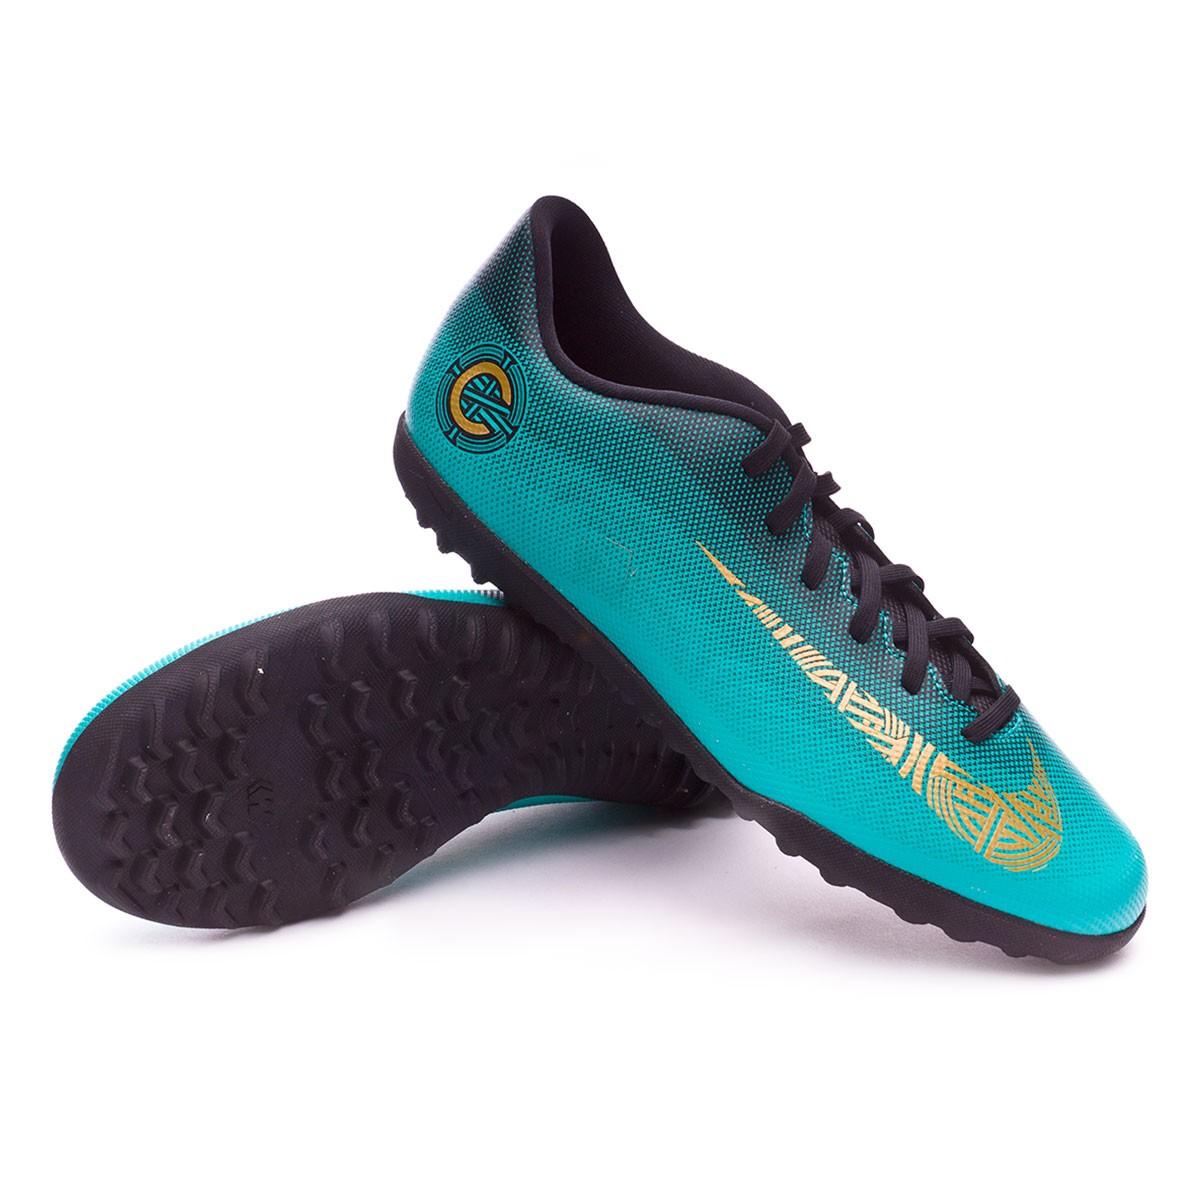 Football Boot Nike Mercurial VaporX XII Club CR7 Turf Clear jade ... 086c269fb96bf